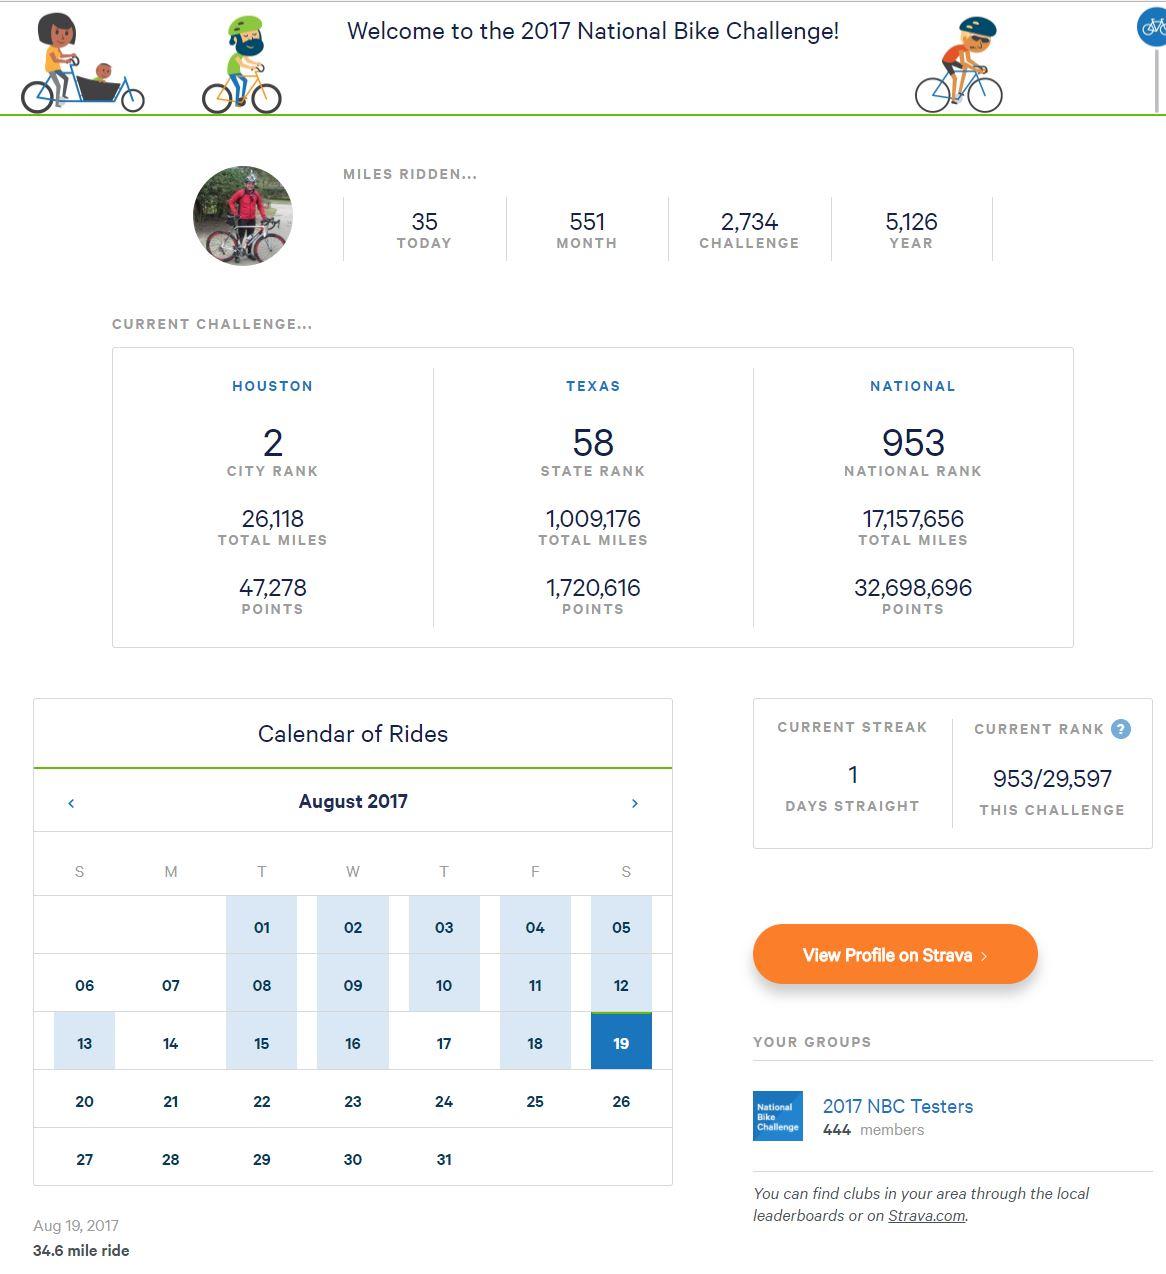 National Bike Challenge Standing